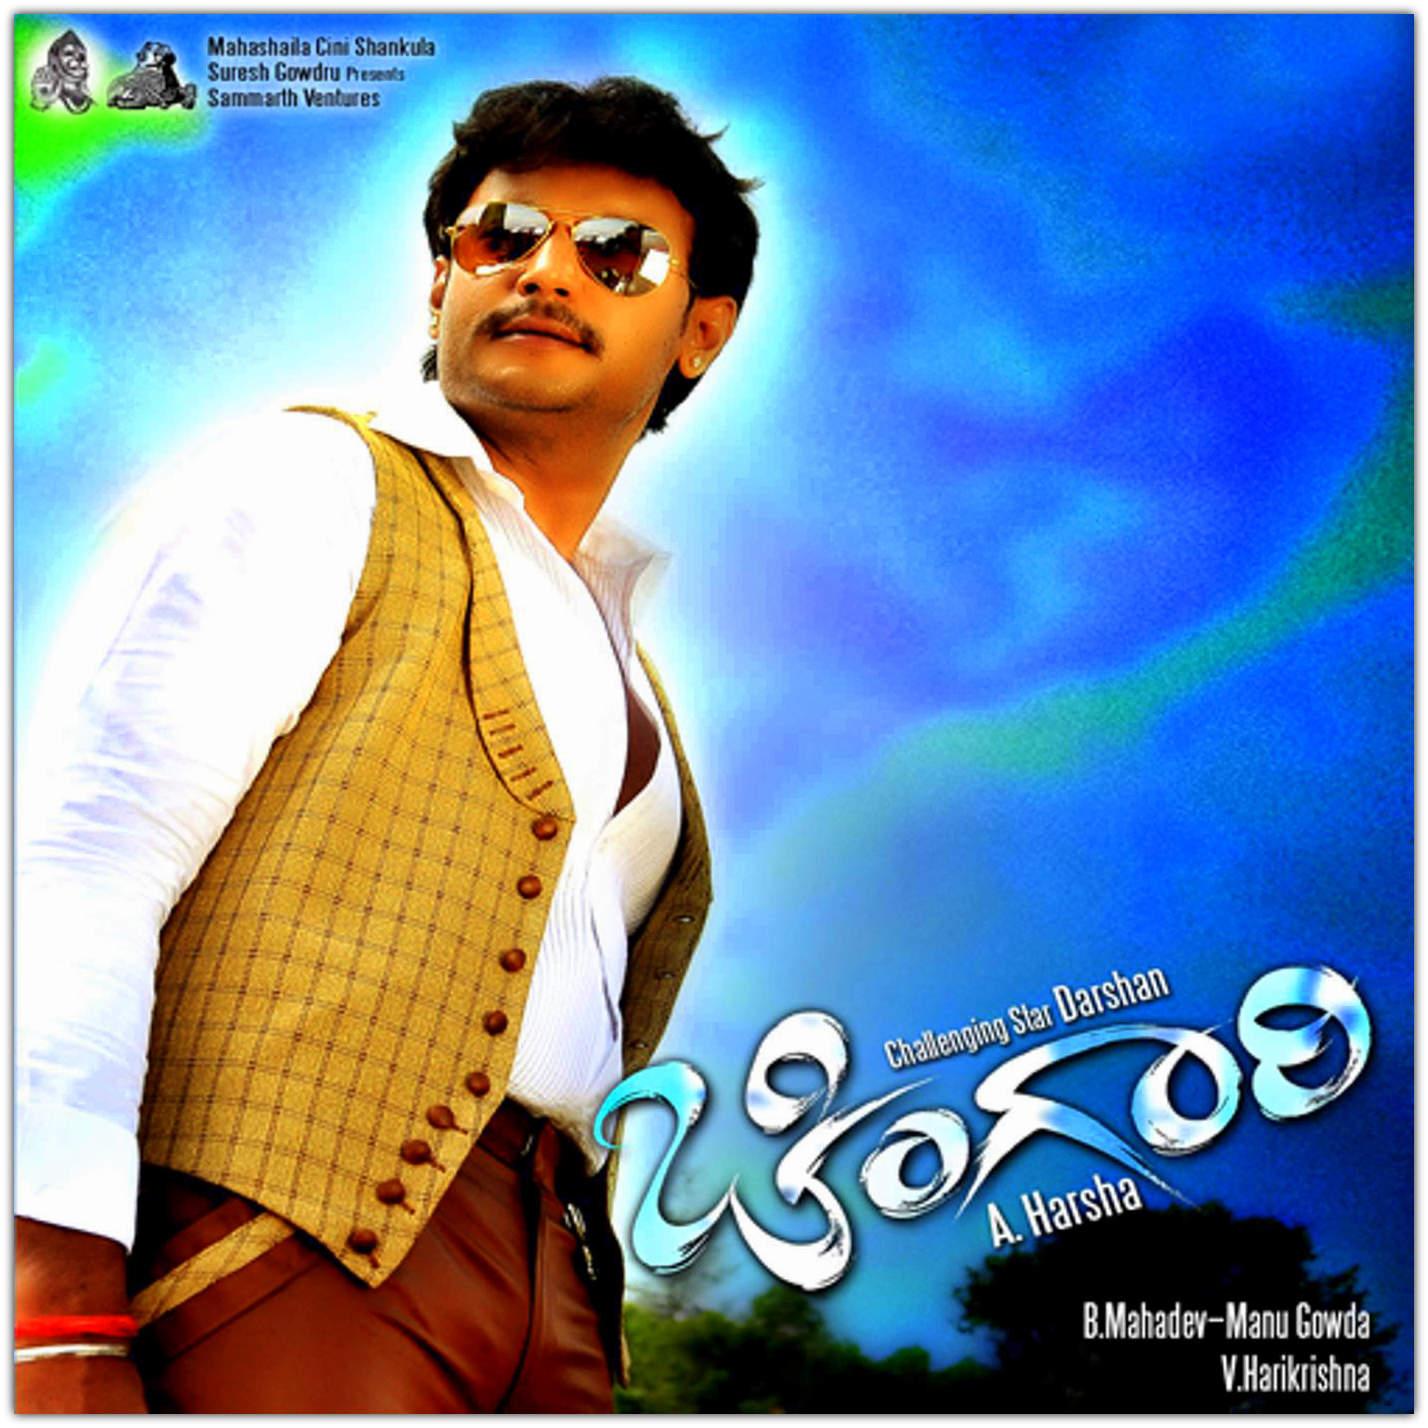 Iam Rider Song Download Mp 3: Kannada Mp3 Songs: Chingari (2012) Kannada Movie Mp3 Songs